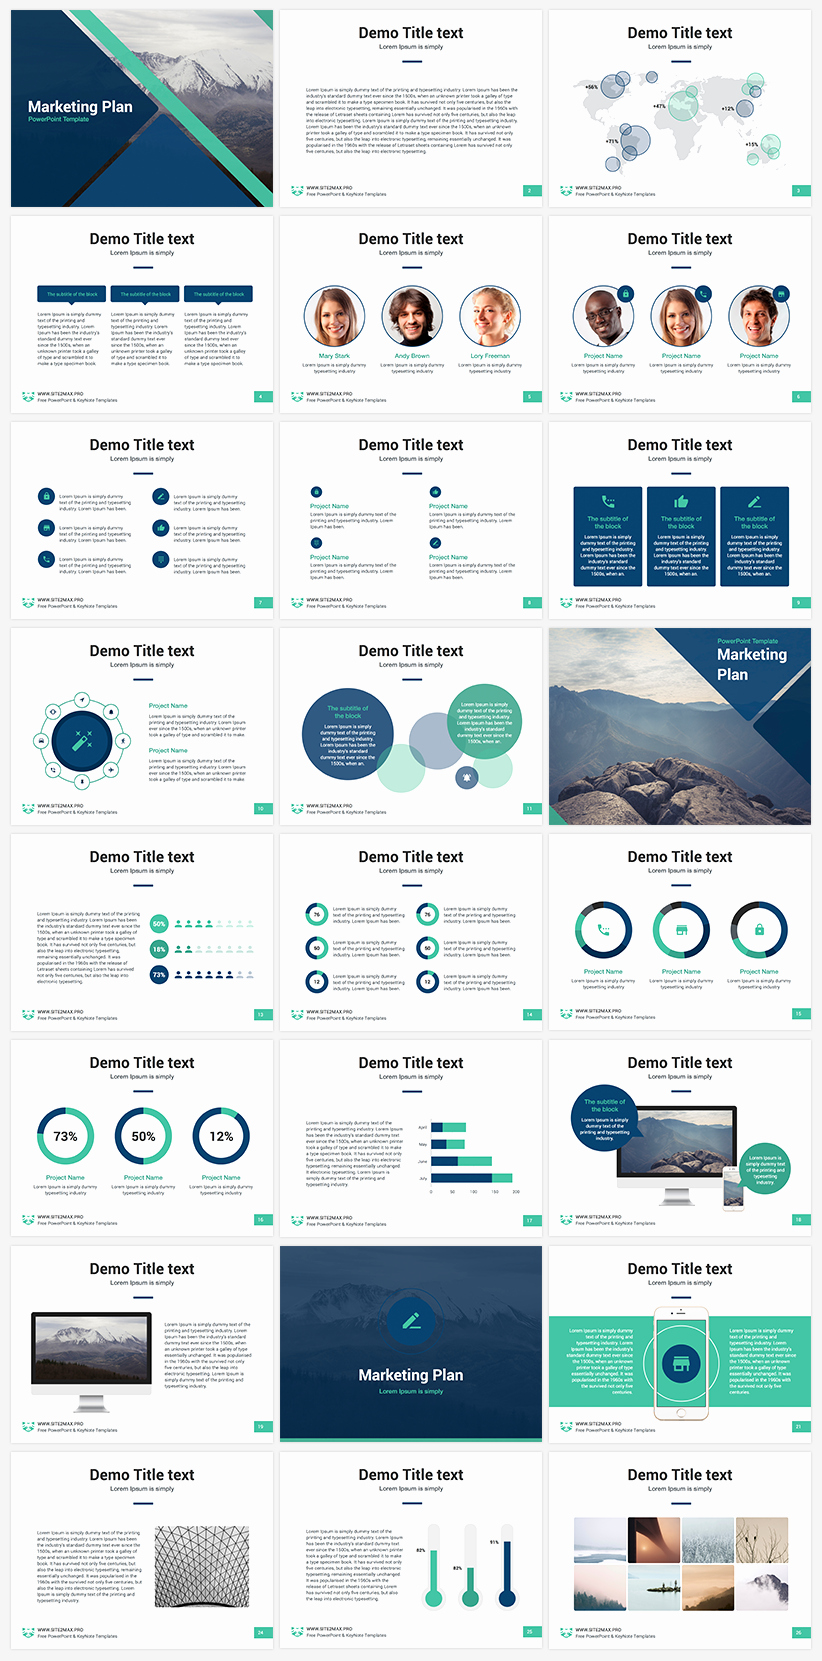 Best Powerpoint Templates Free Download Luxury the Best 8 Free Powerpoint Templates